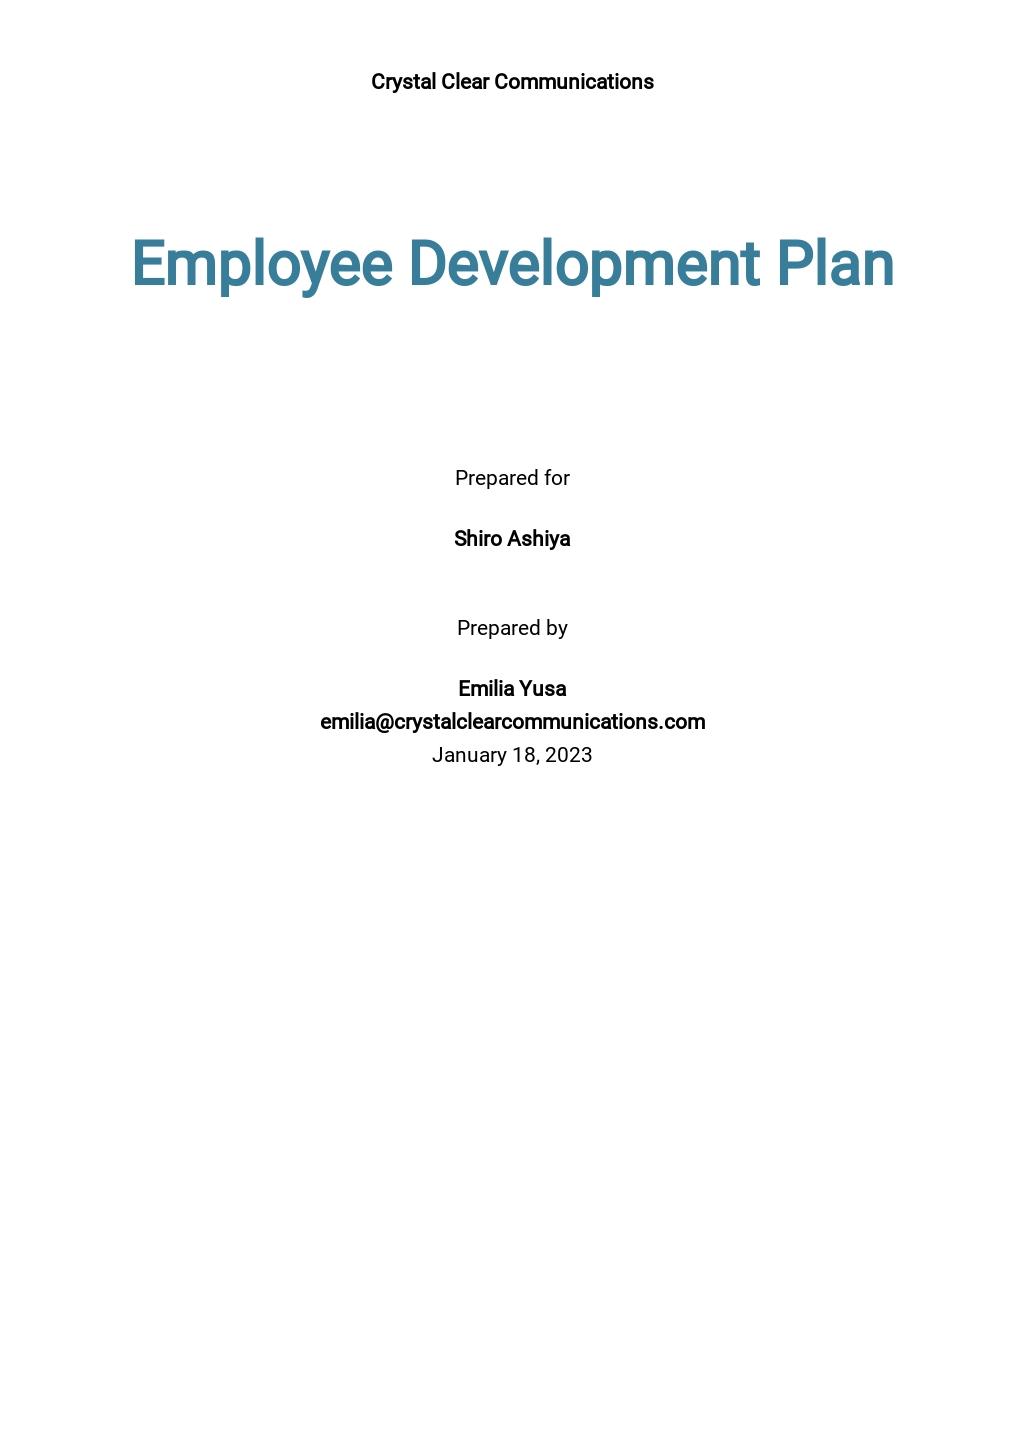 Employee Development Plan Template.jpe